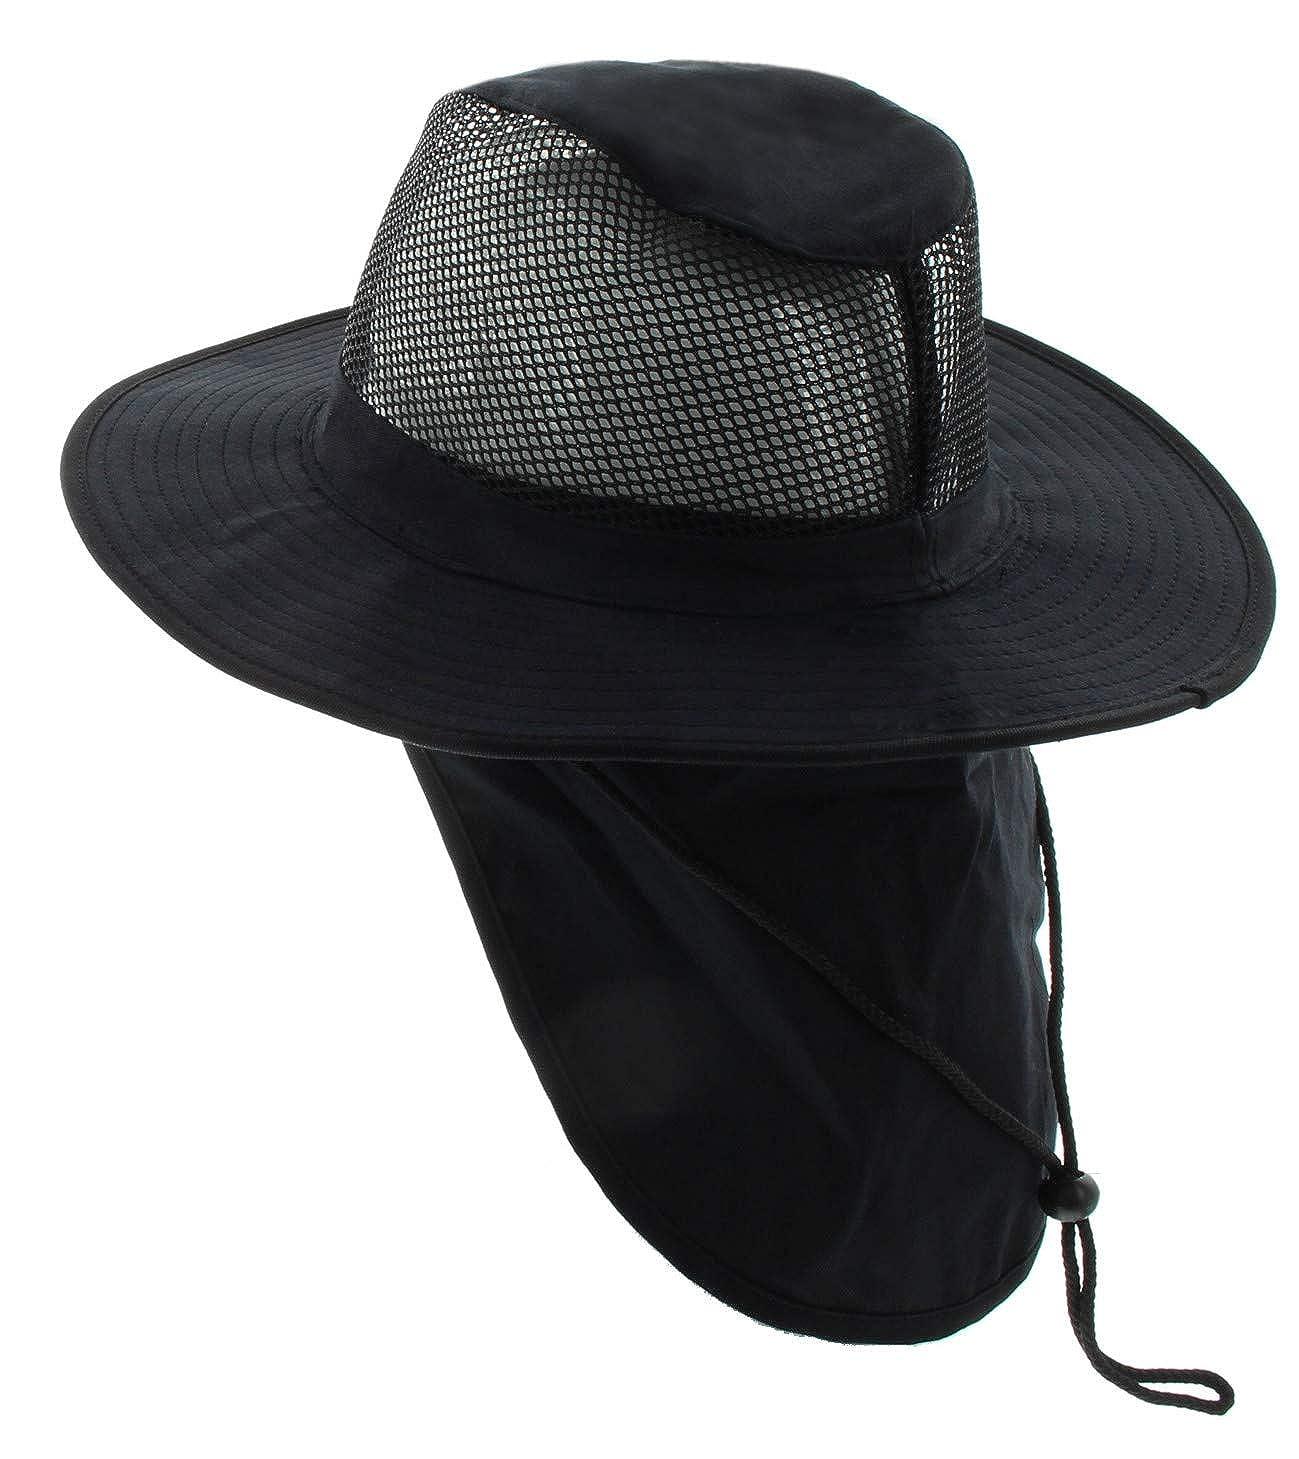 76e96c134adb37 JFH Wide Brim Bora Booney Outdoor Safari Summer Hat w/Neck Flap & Sun  Protection at Amazon Men's Clothing store: